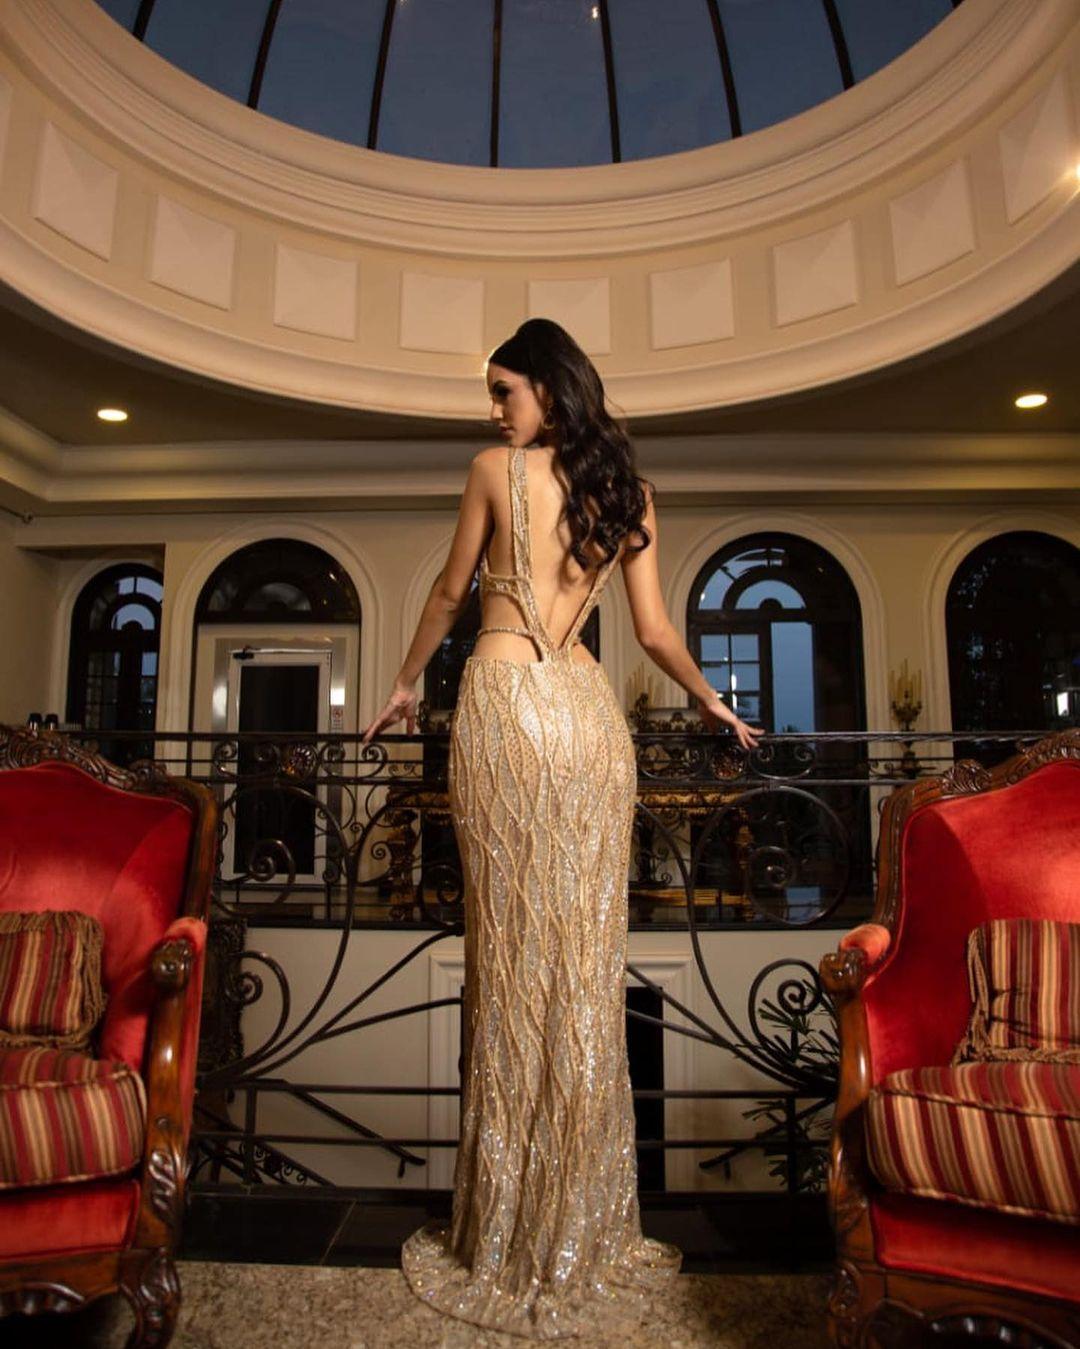 rafaella felipe, top 20 de miss brasil mundo 2019. - Página 8 69557610